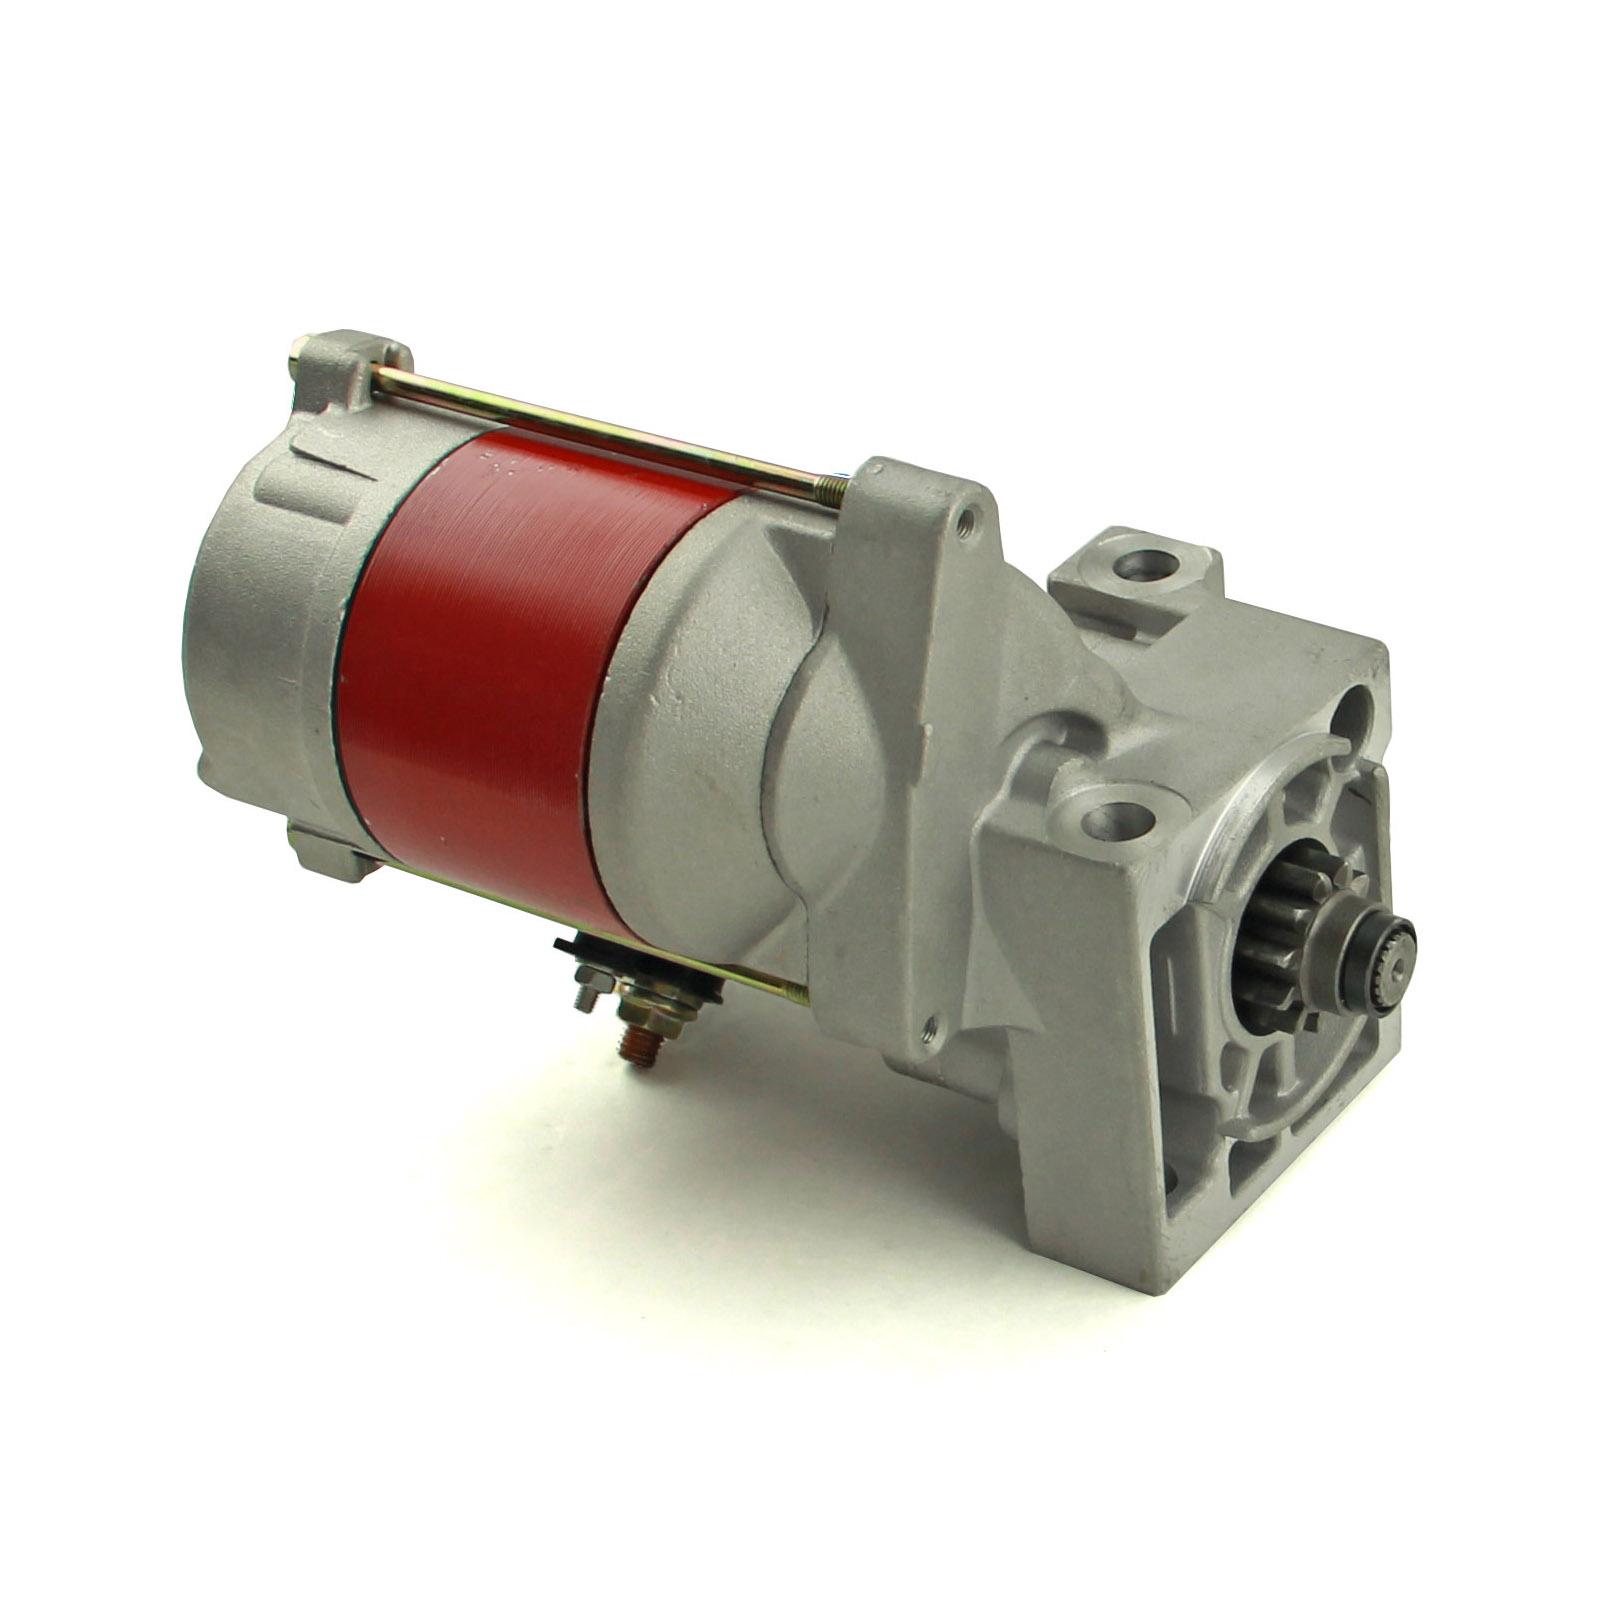 Chevy 350 Starter Motor On Chevy High Torque Starter Wiring Diagram